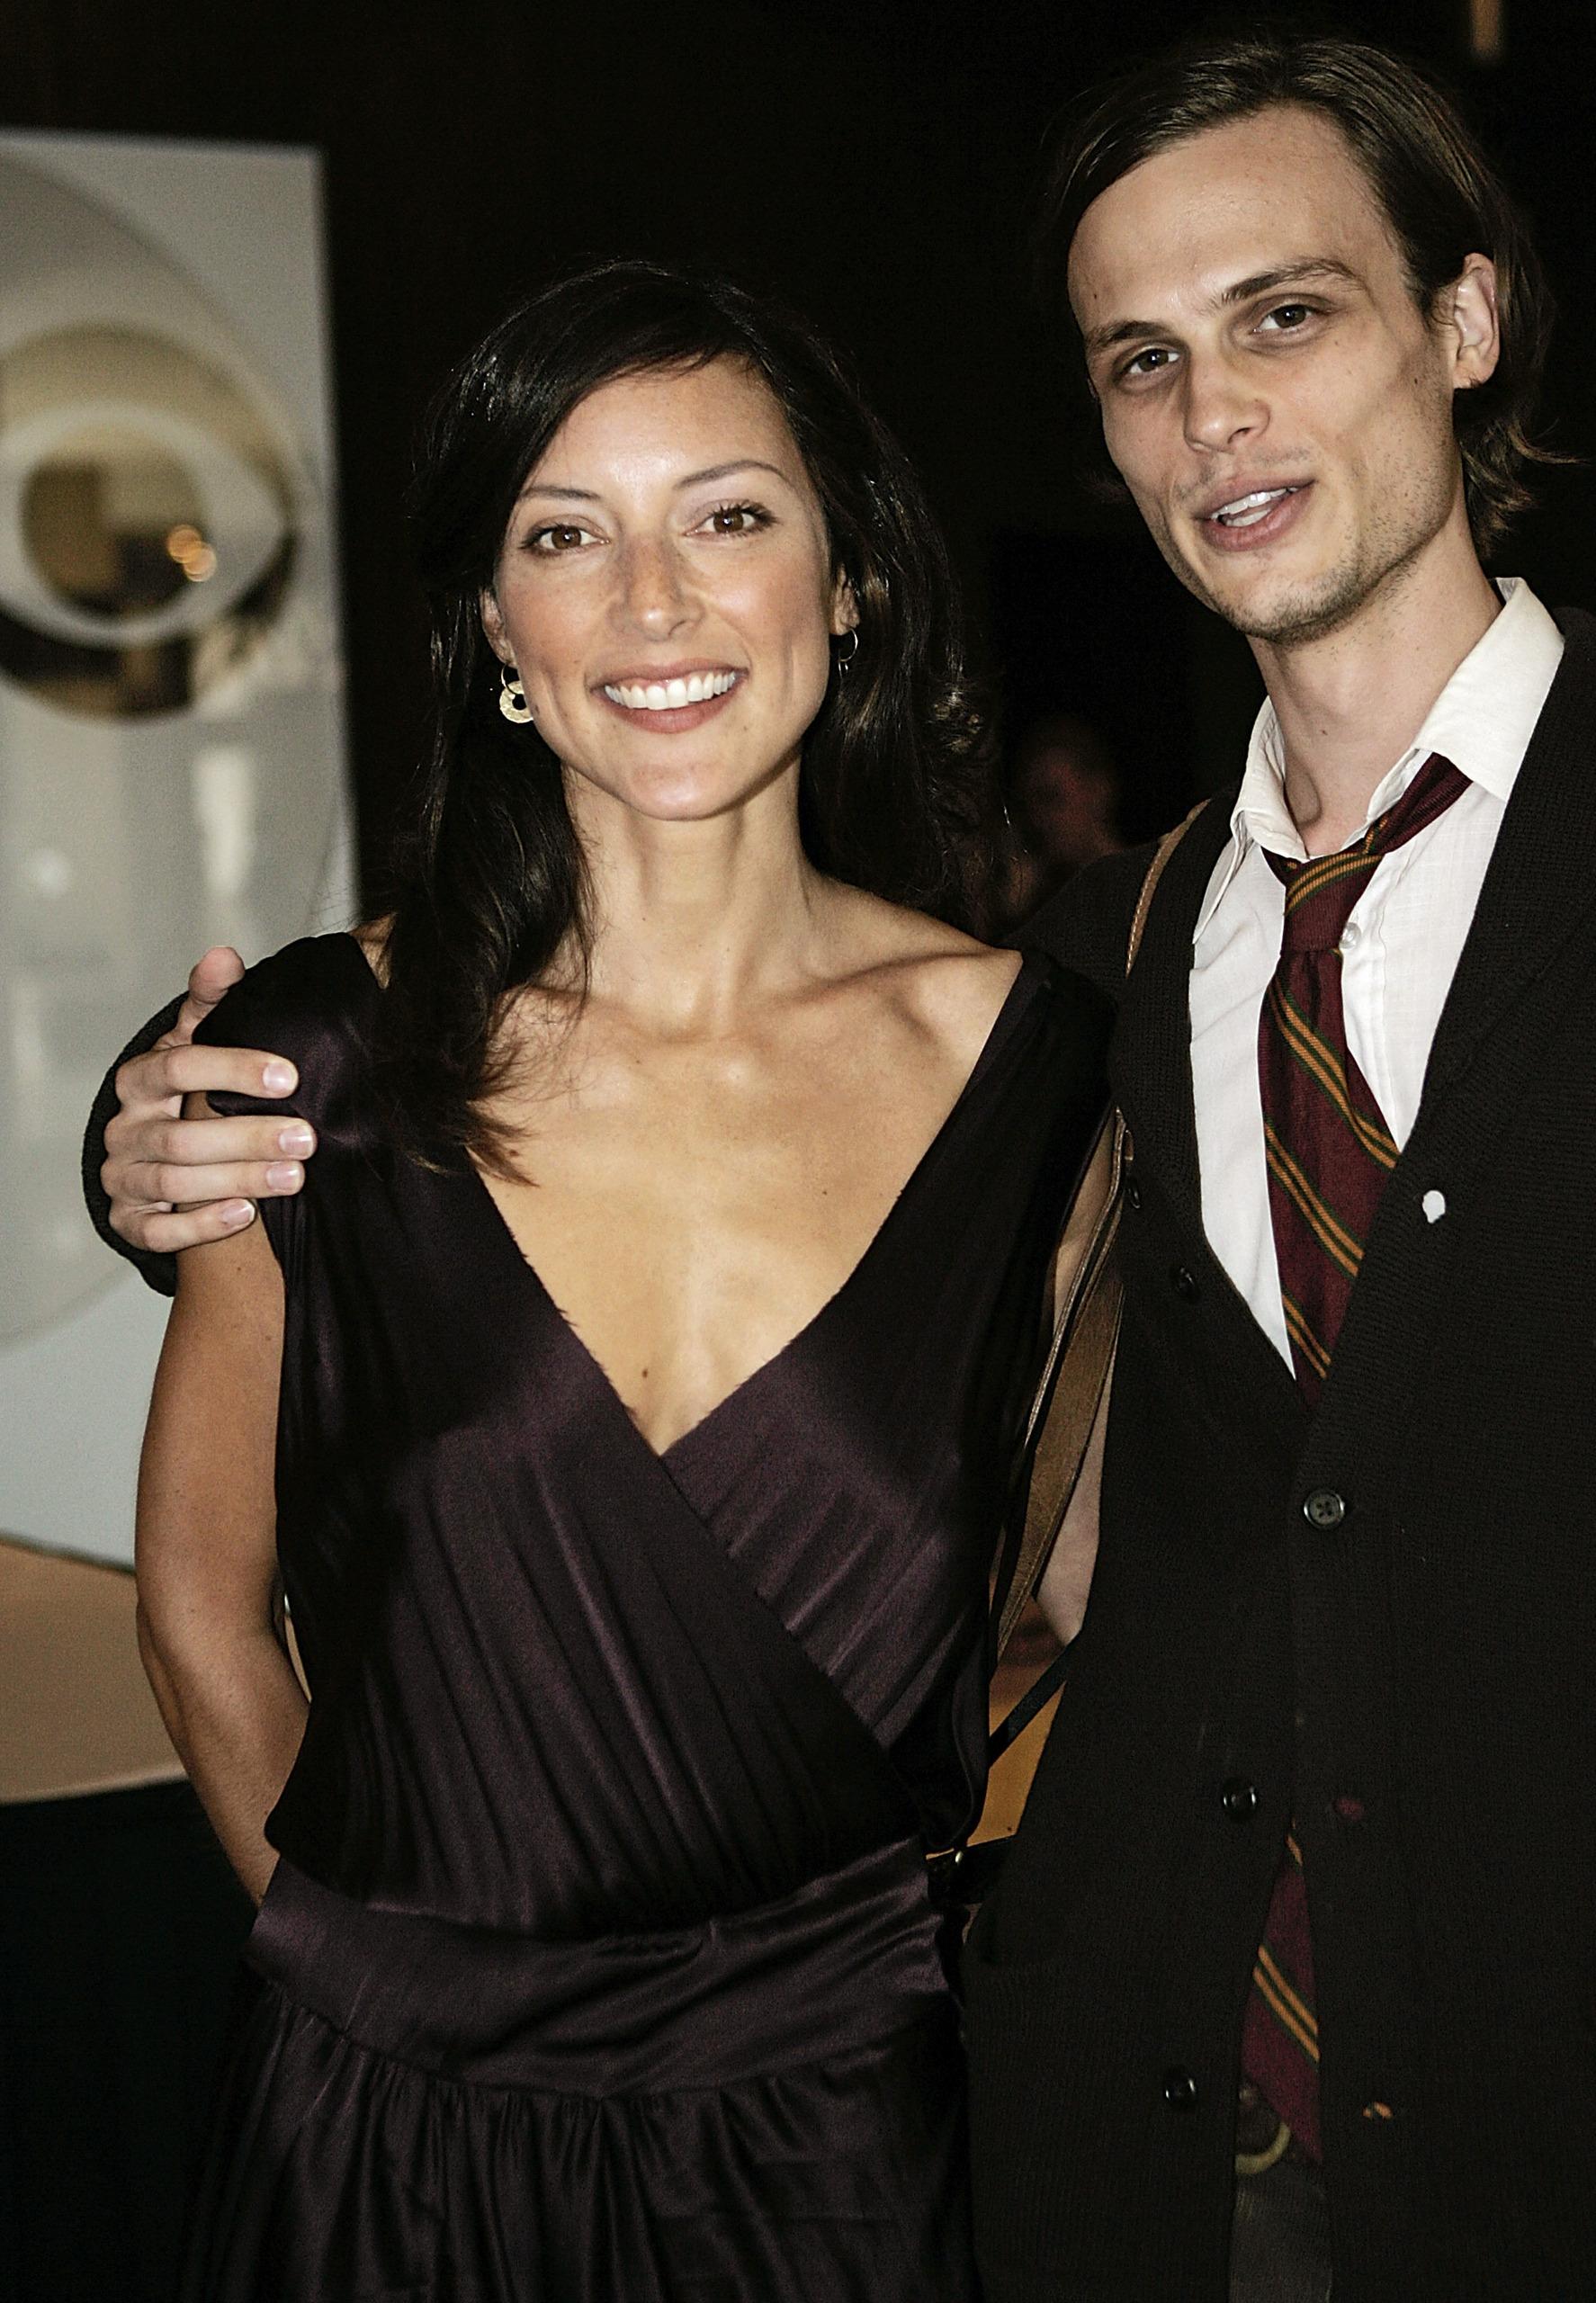 MGG&Lola Glaudini @ CBS TCA summer 2005 press-tour - HQ